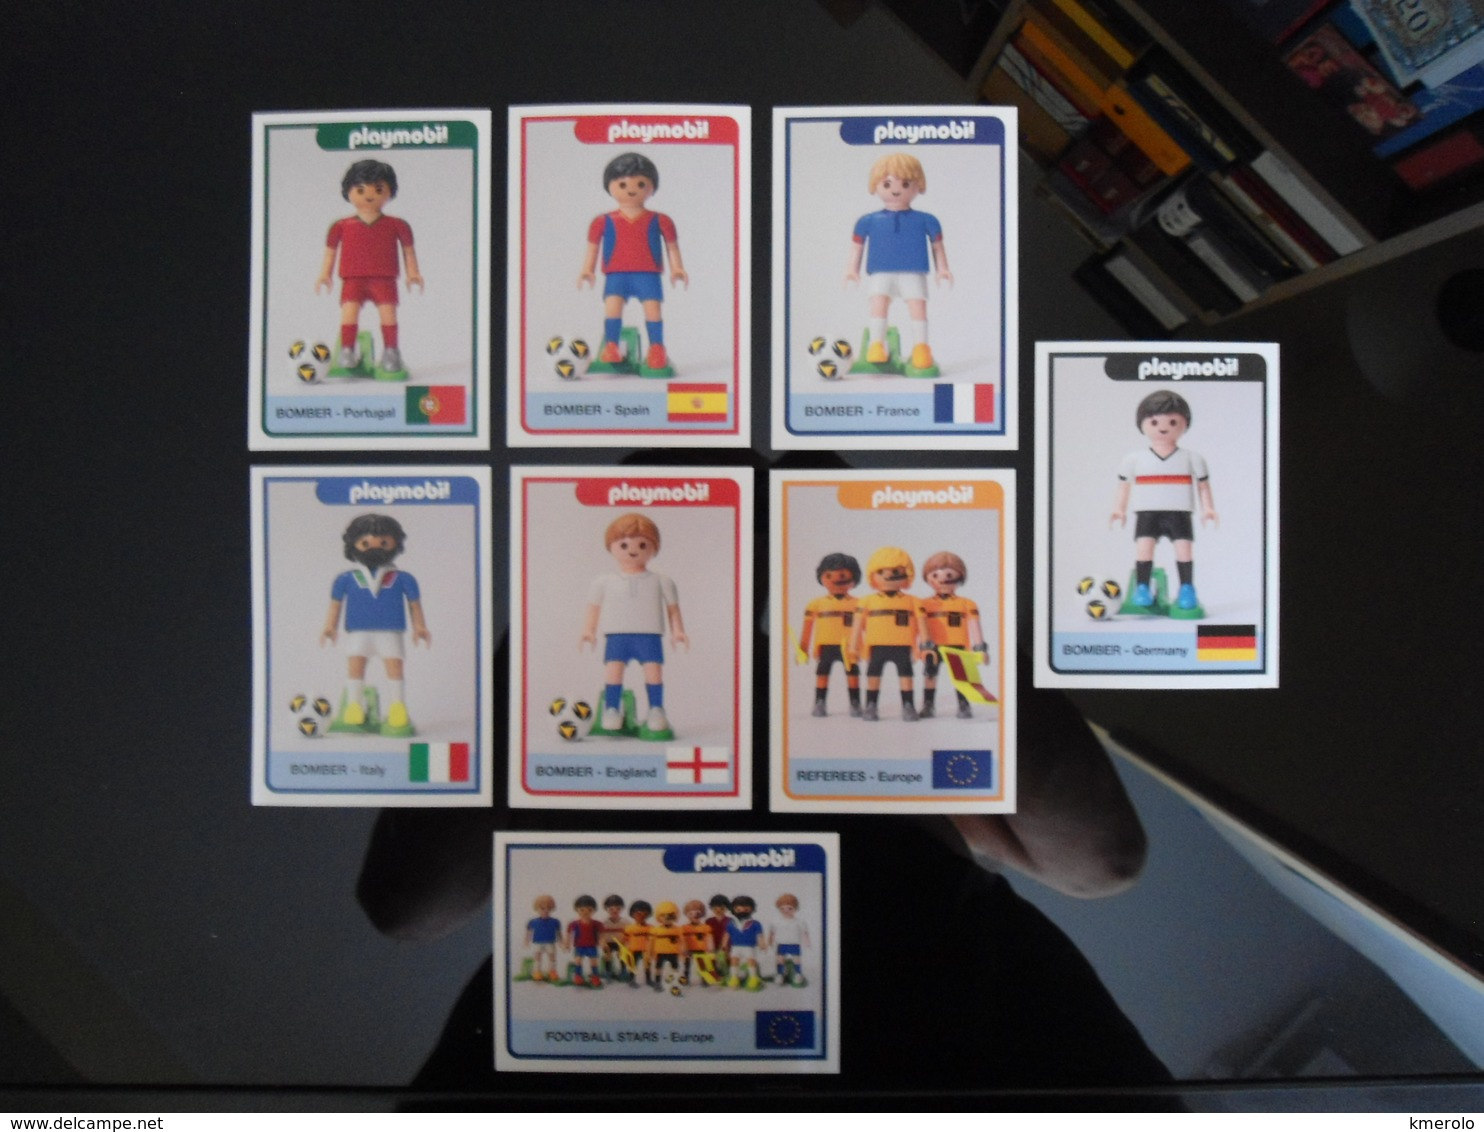 PLAYMOBIL 2016 European Football Championship Lot De 8 Cartes Postales - Speelgoed & Spelen